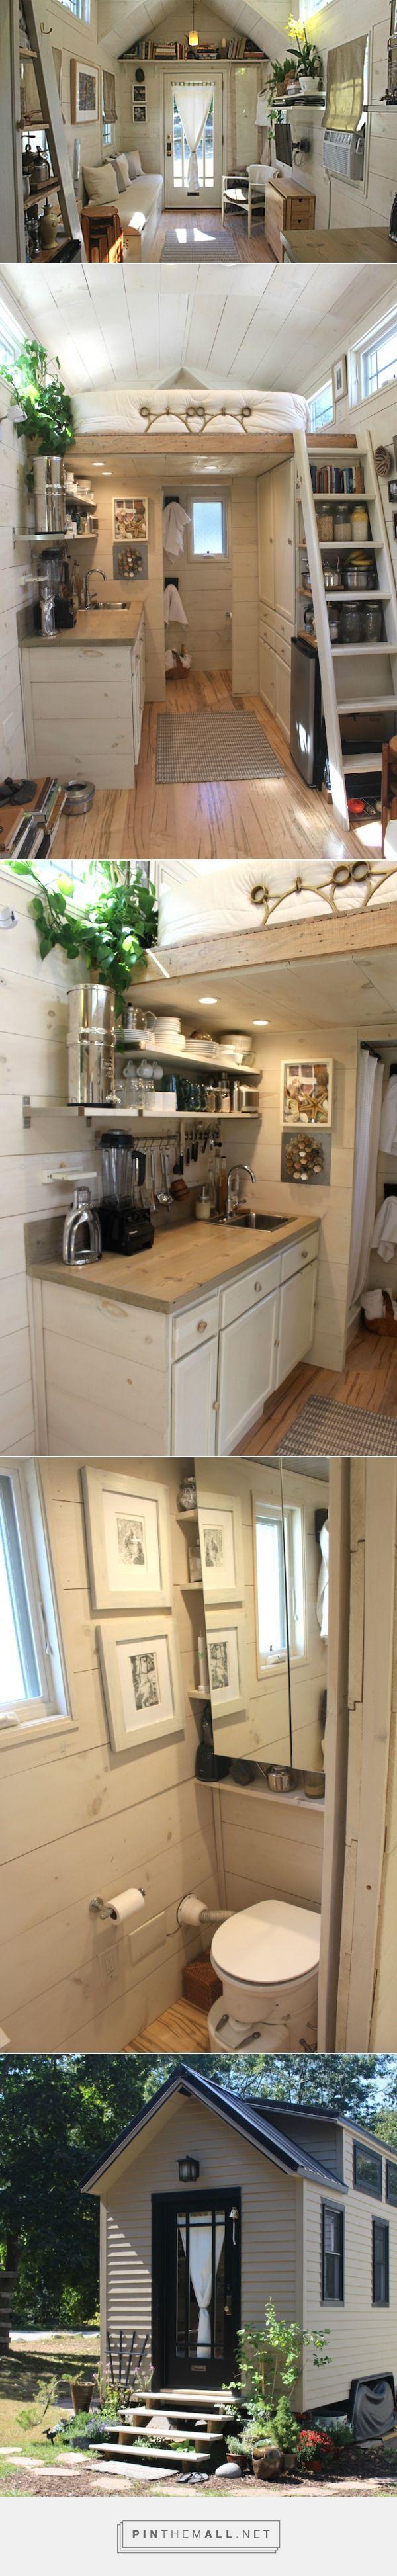 Impressive Tiny House Built for Under $30K Fits Family of 3